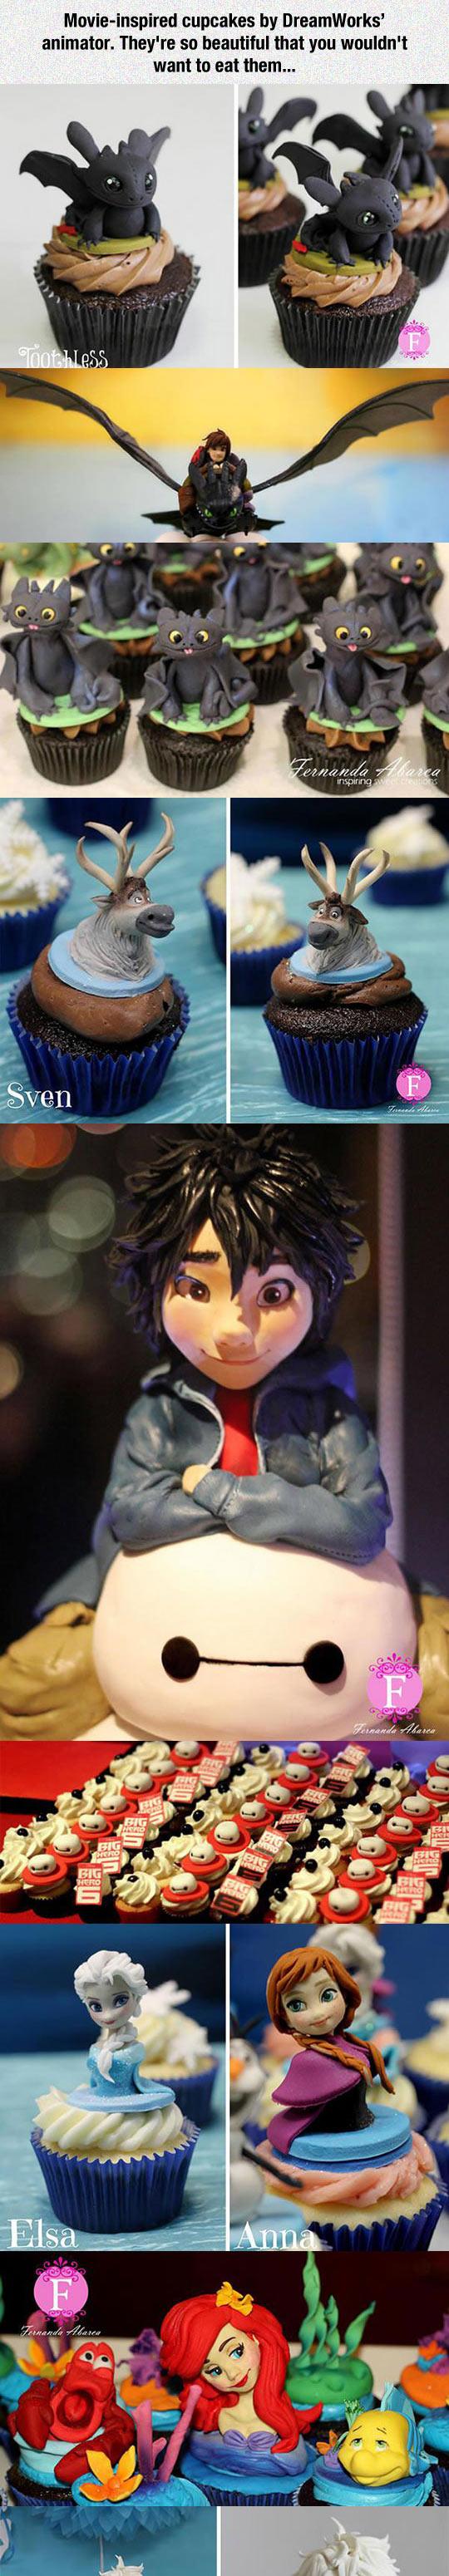 Movie-Inspired Cupcakes